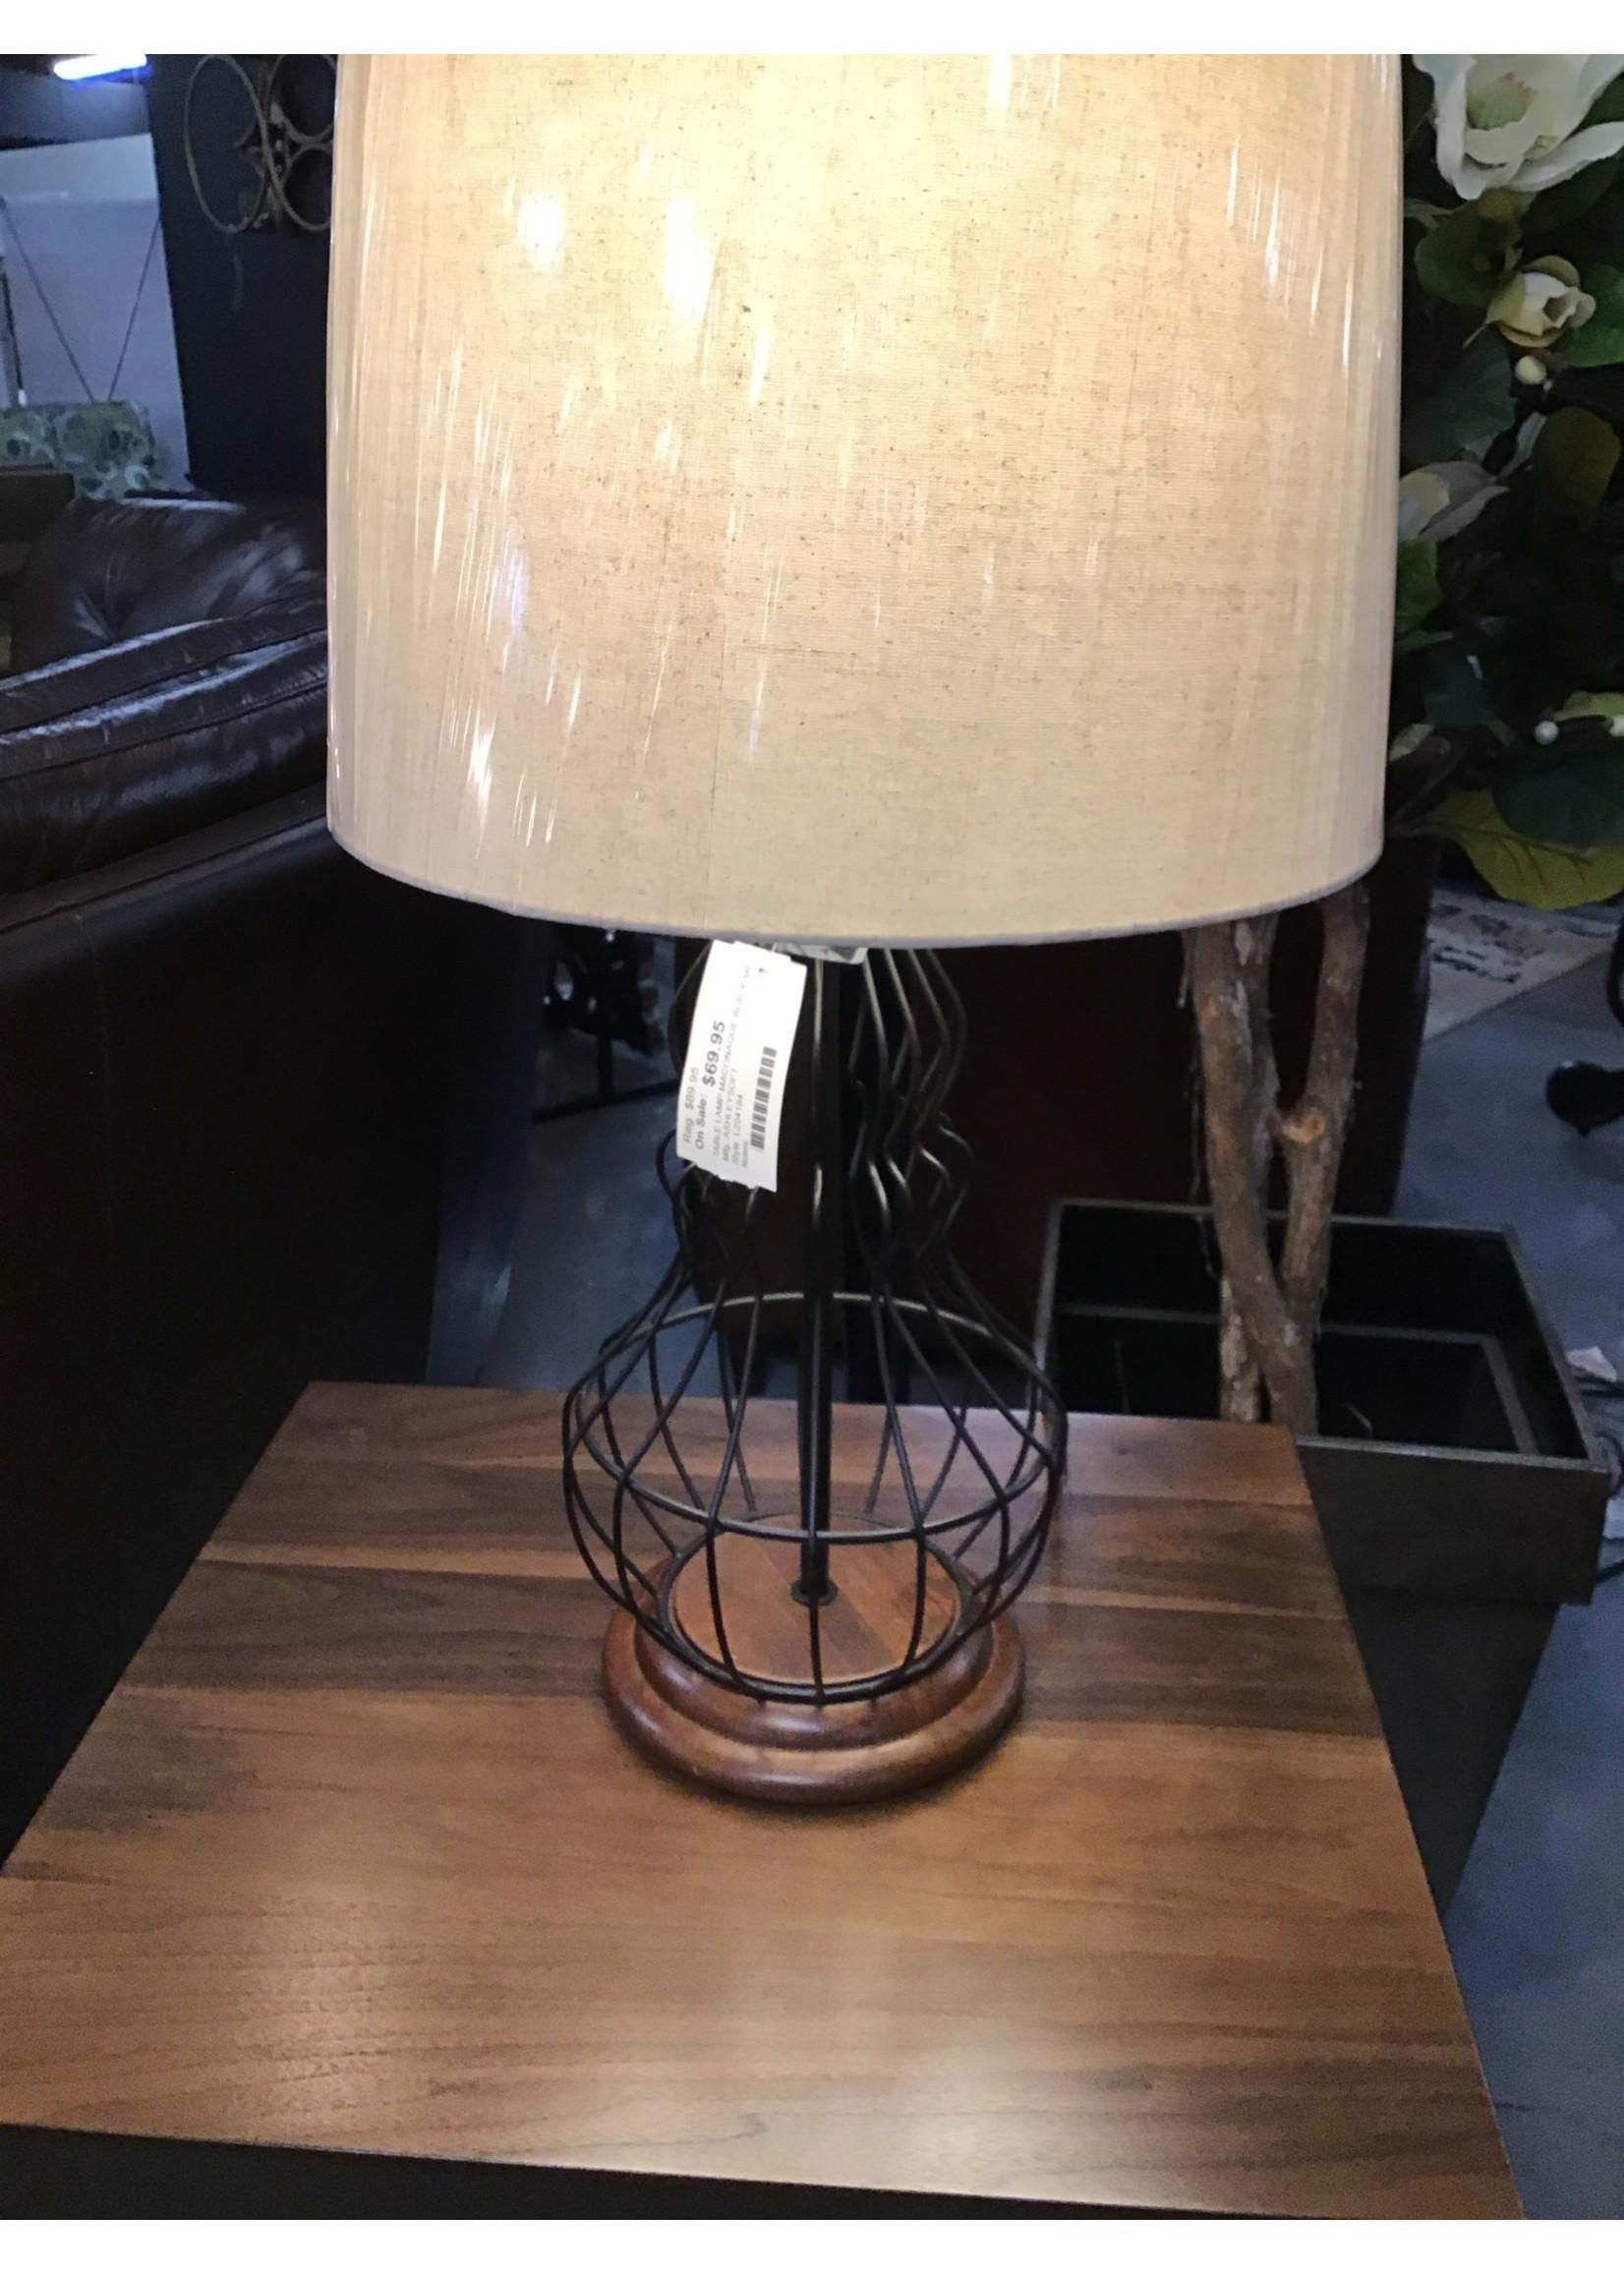 ASHLEY MACONAQUE TABLE LAMP IN BLACK METAL